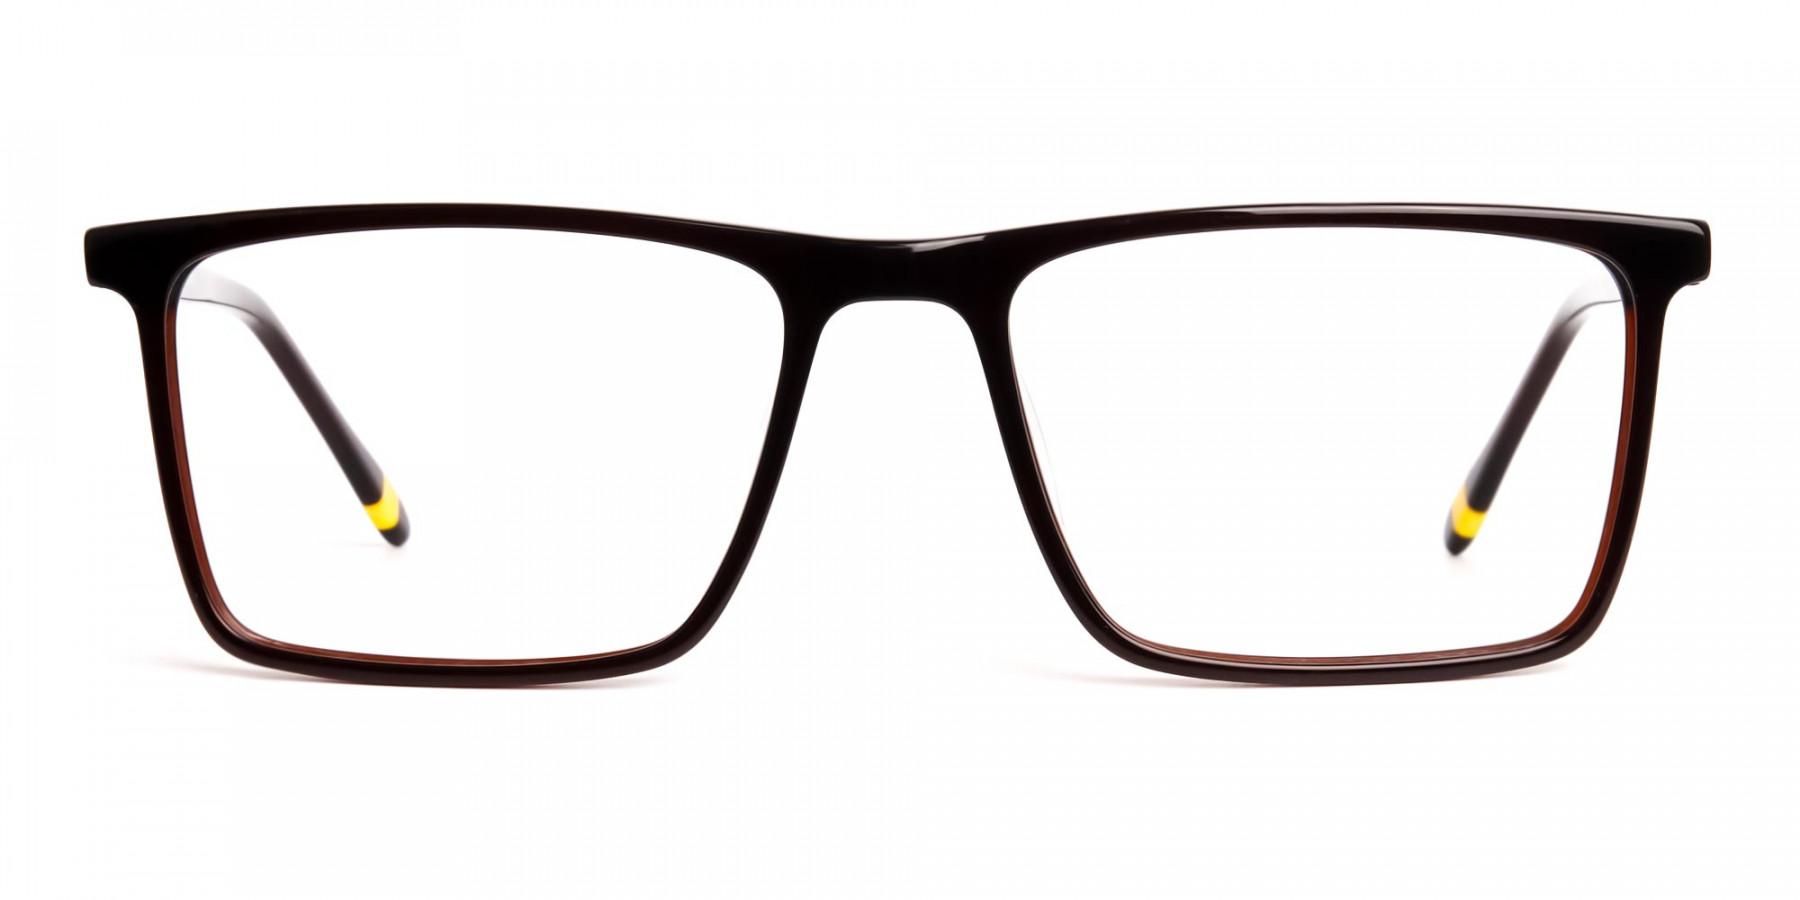 classic-dark-brown-full-rim-rectangular-glasses-frames-1